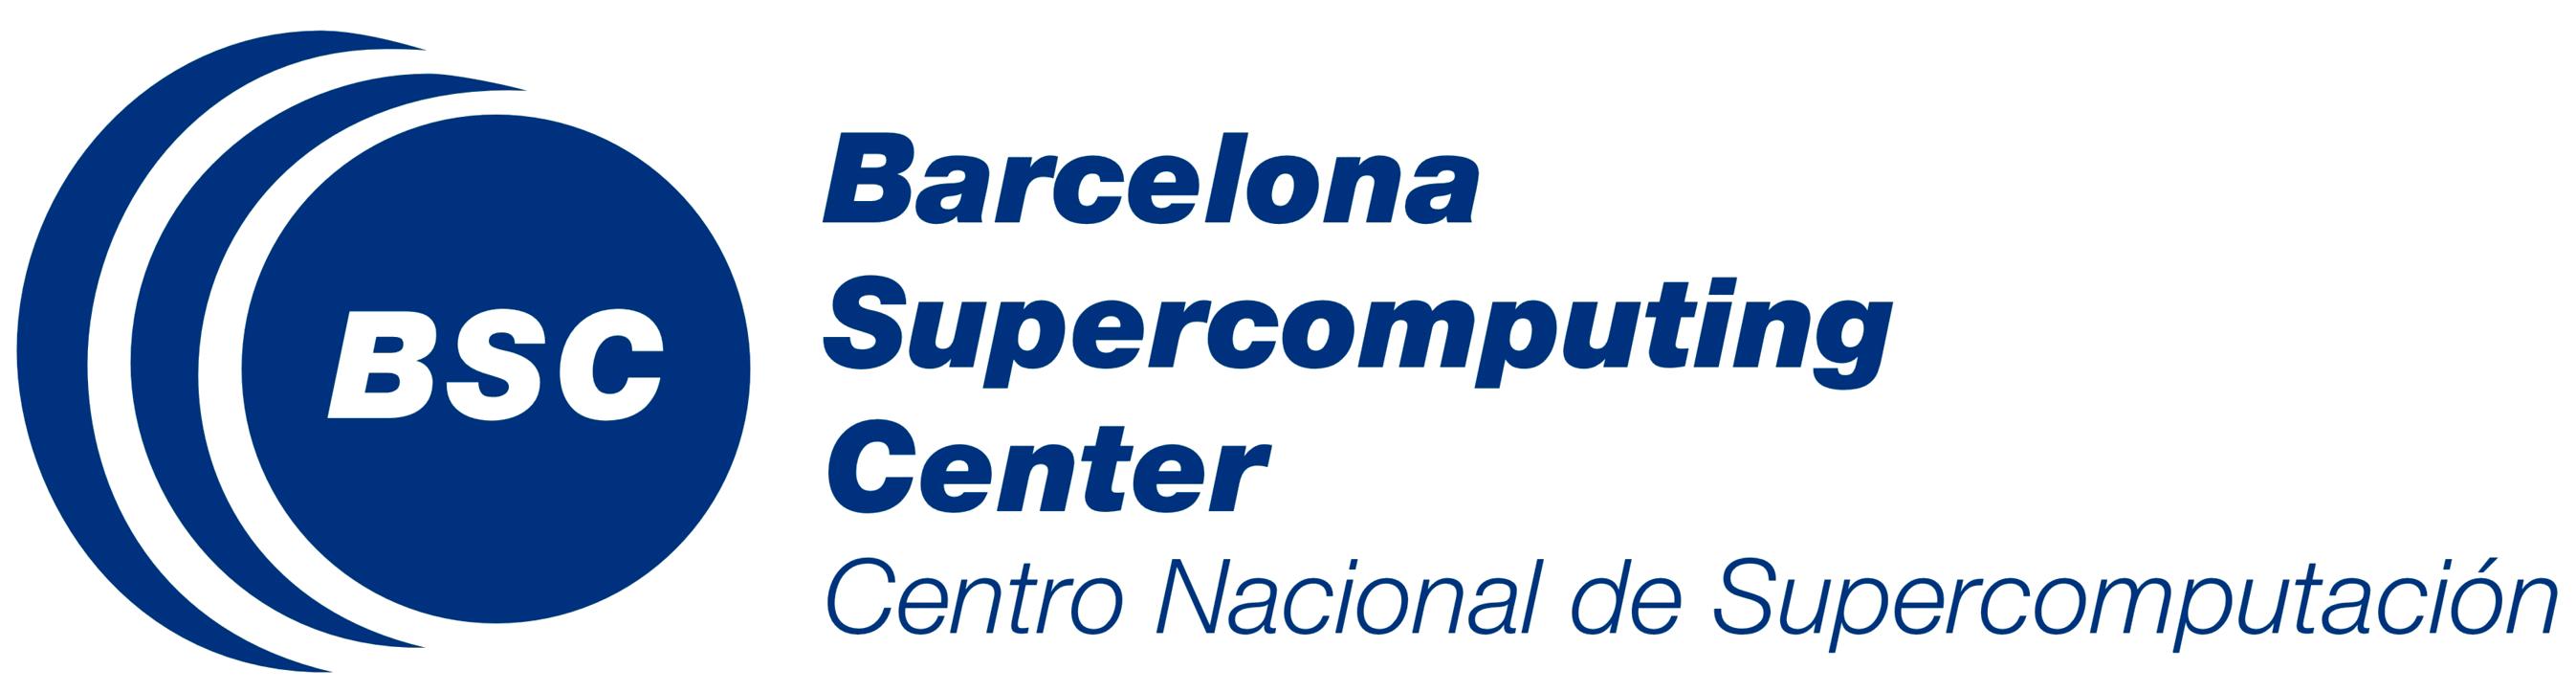 biysc_bsc_logo.jpg